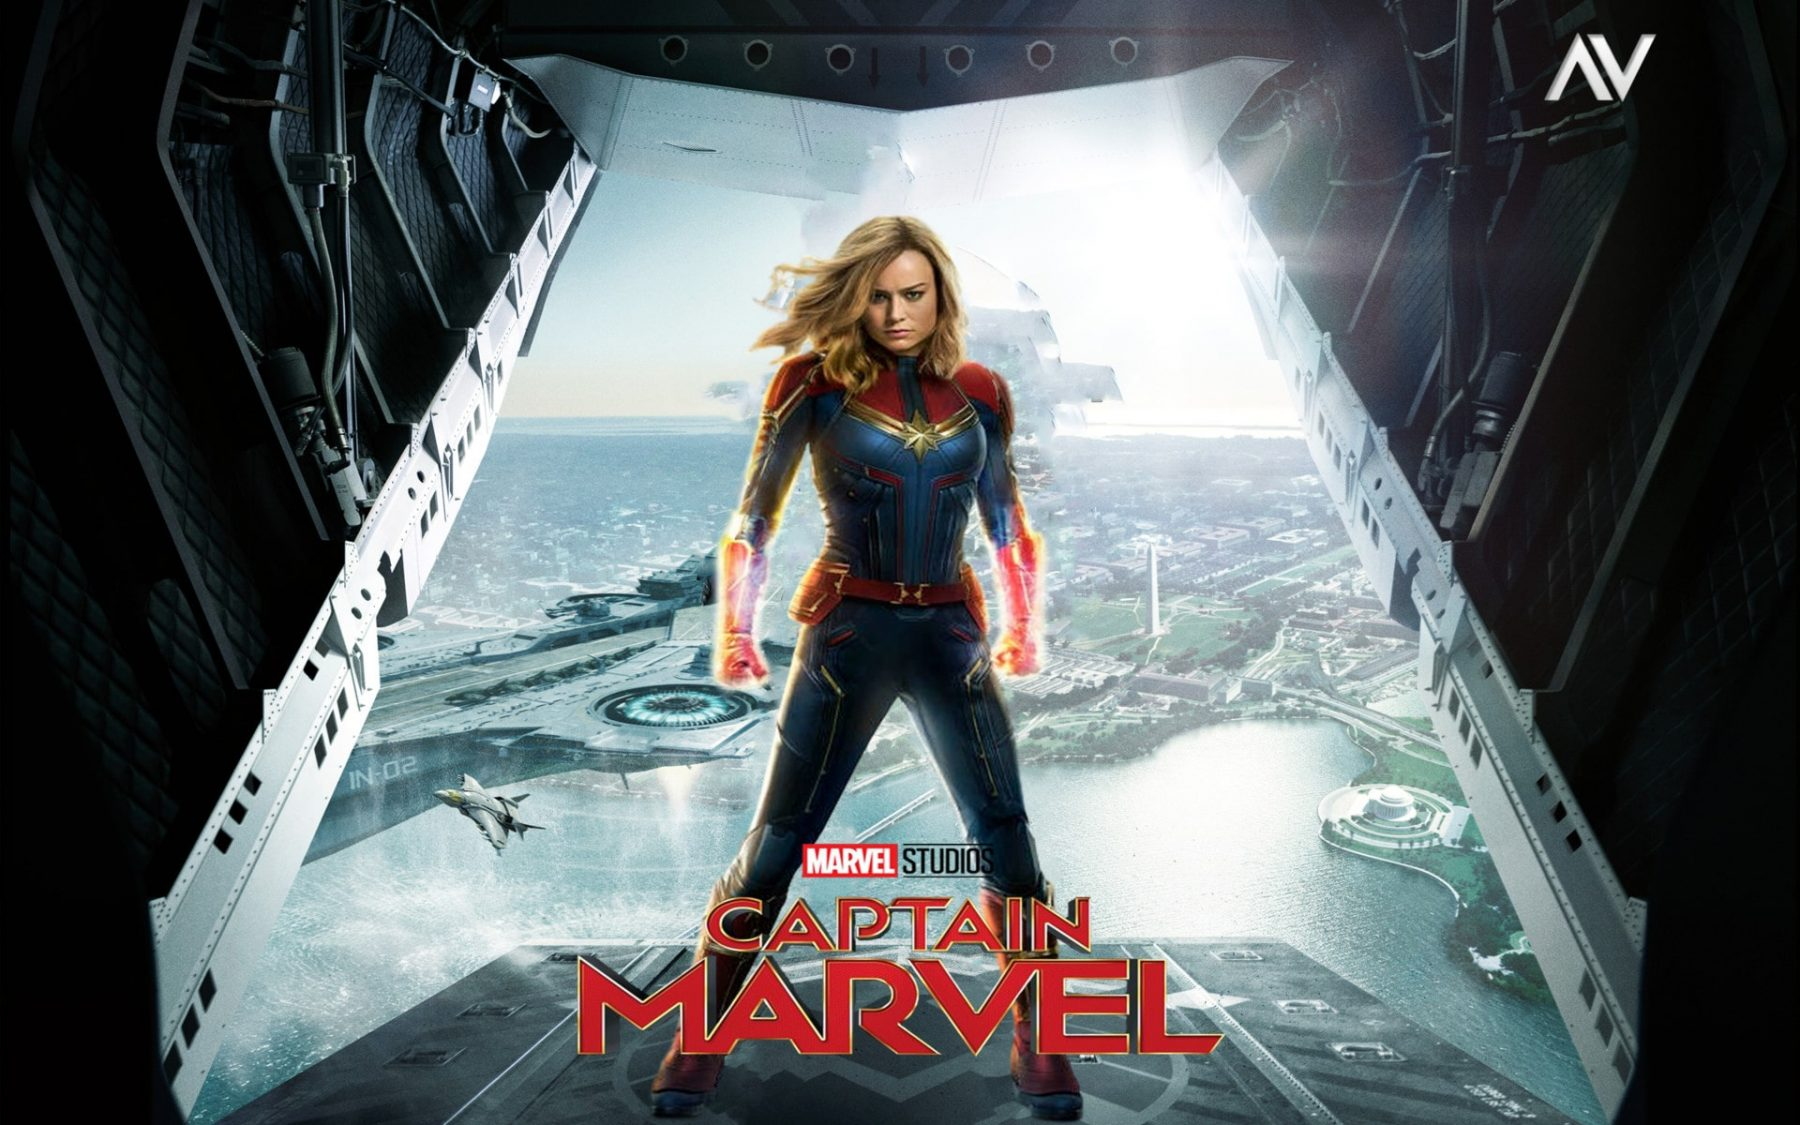 Captain Marvel Hd Wallpapers 7wallpapers Net